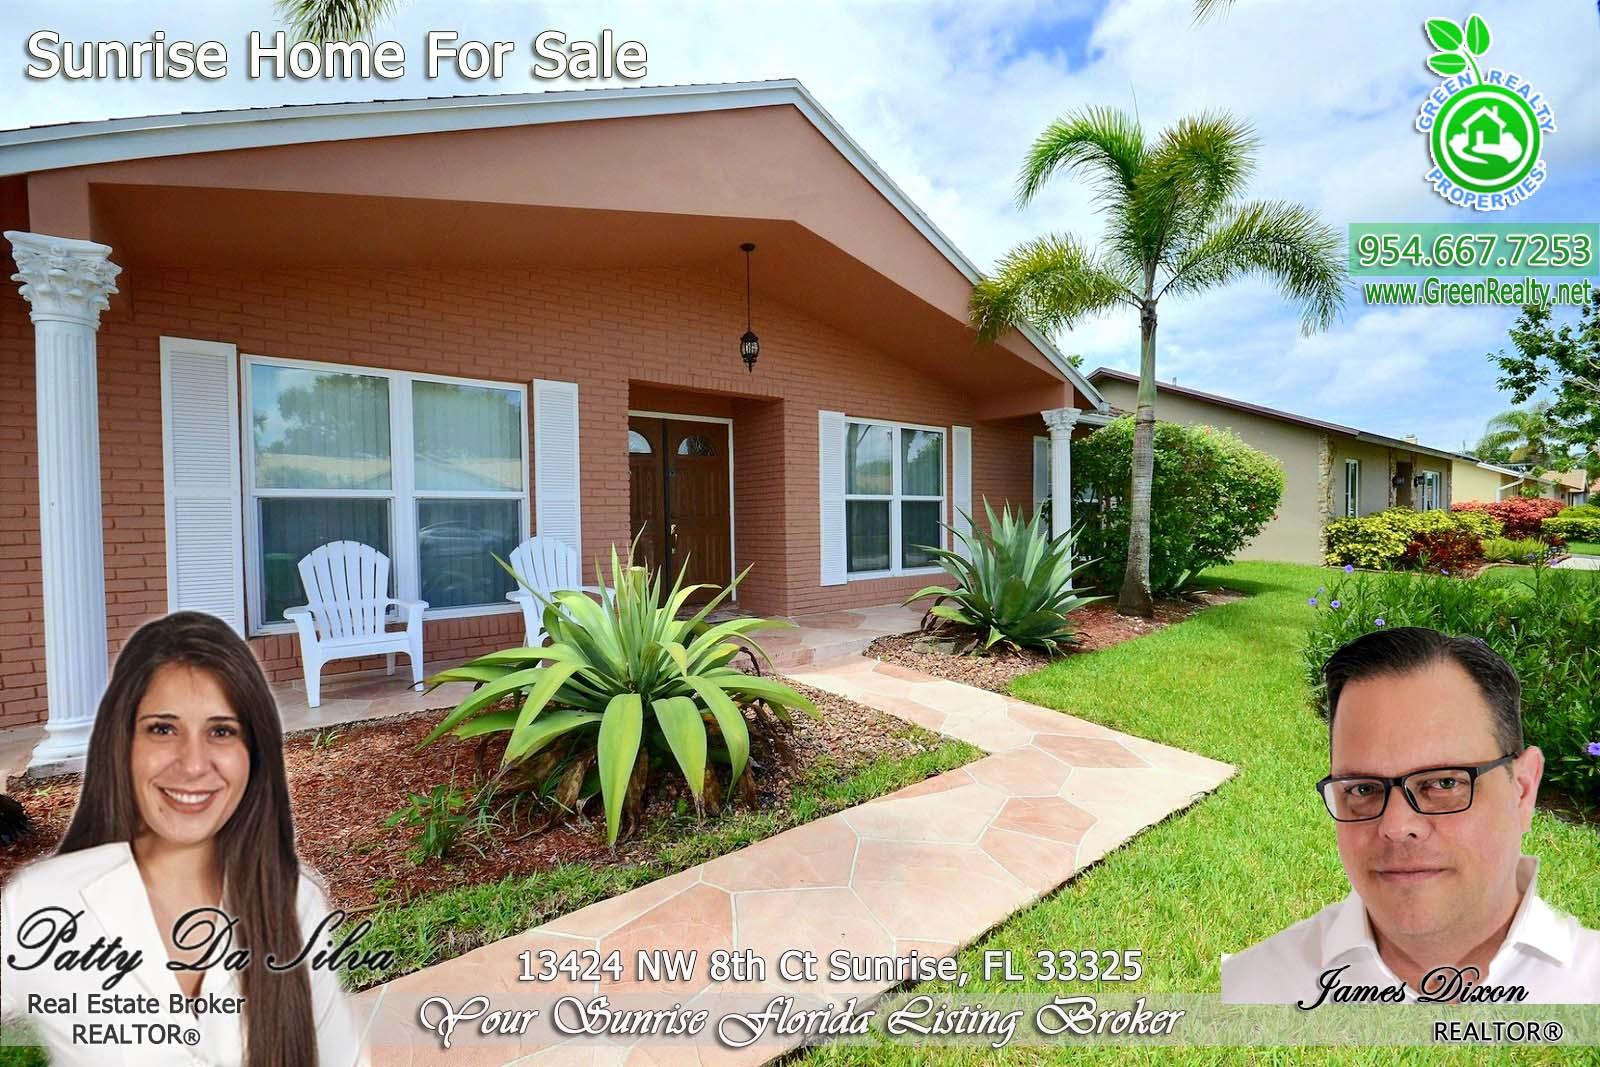 2 Sunrise Florida Homes For Sale (1)